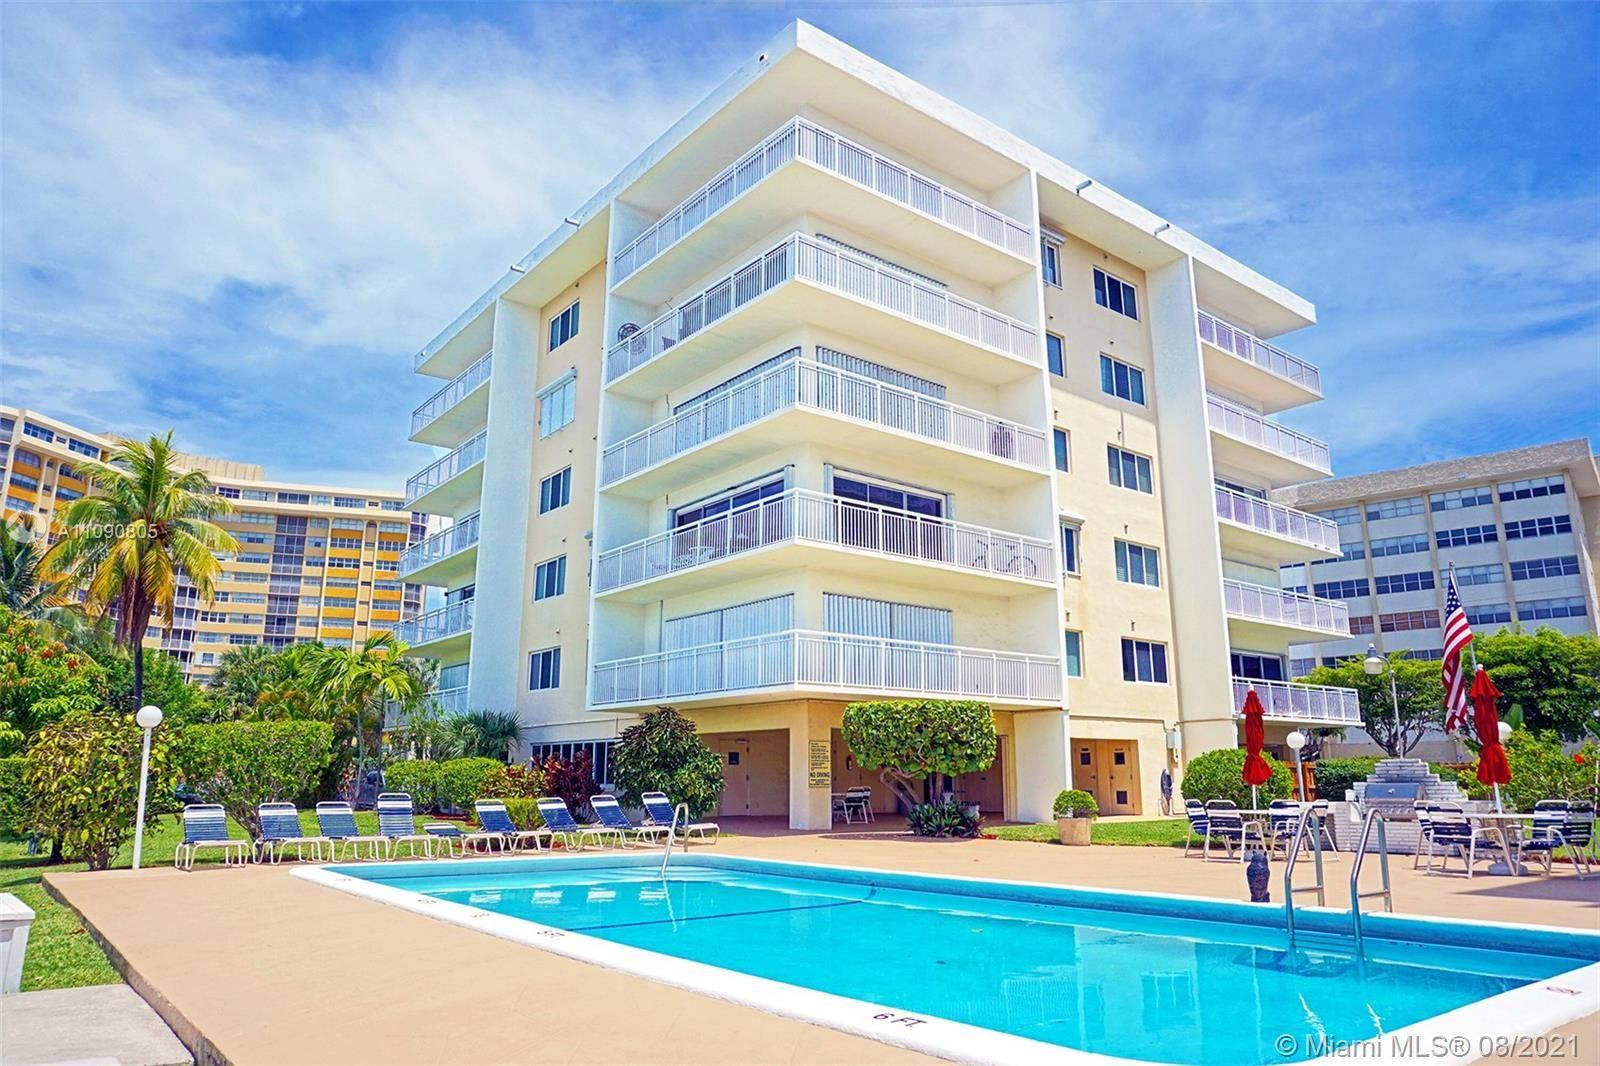 120 Golden Isles Dr #62B, Hallandale Beach, FL 33009 - #: A11090805